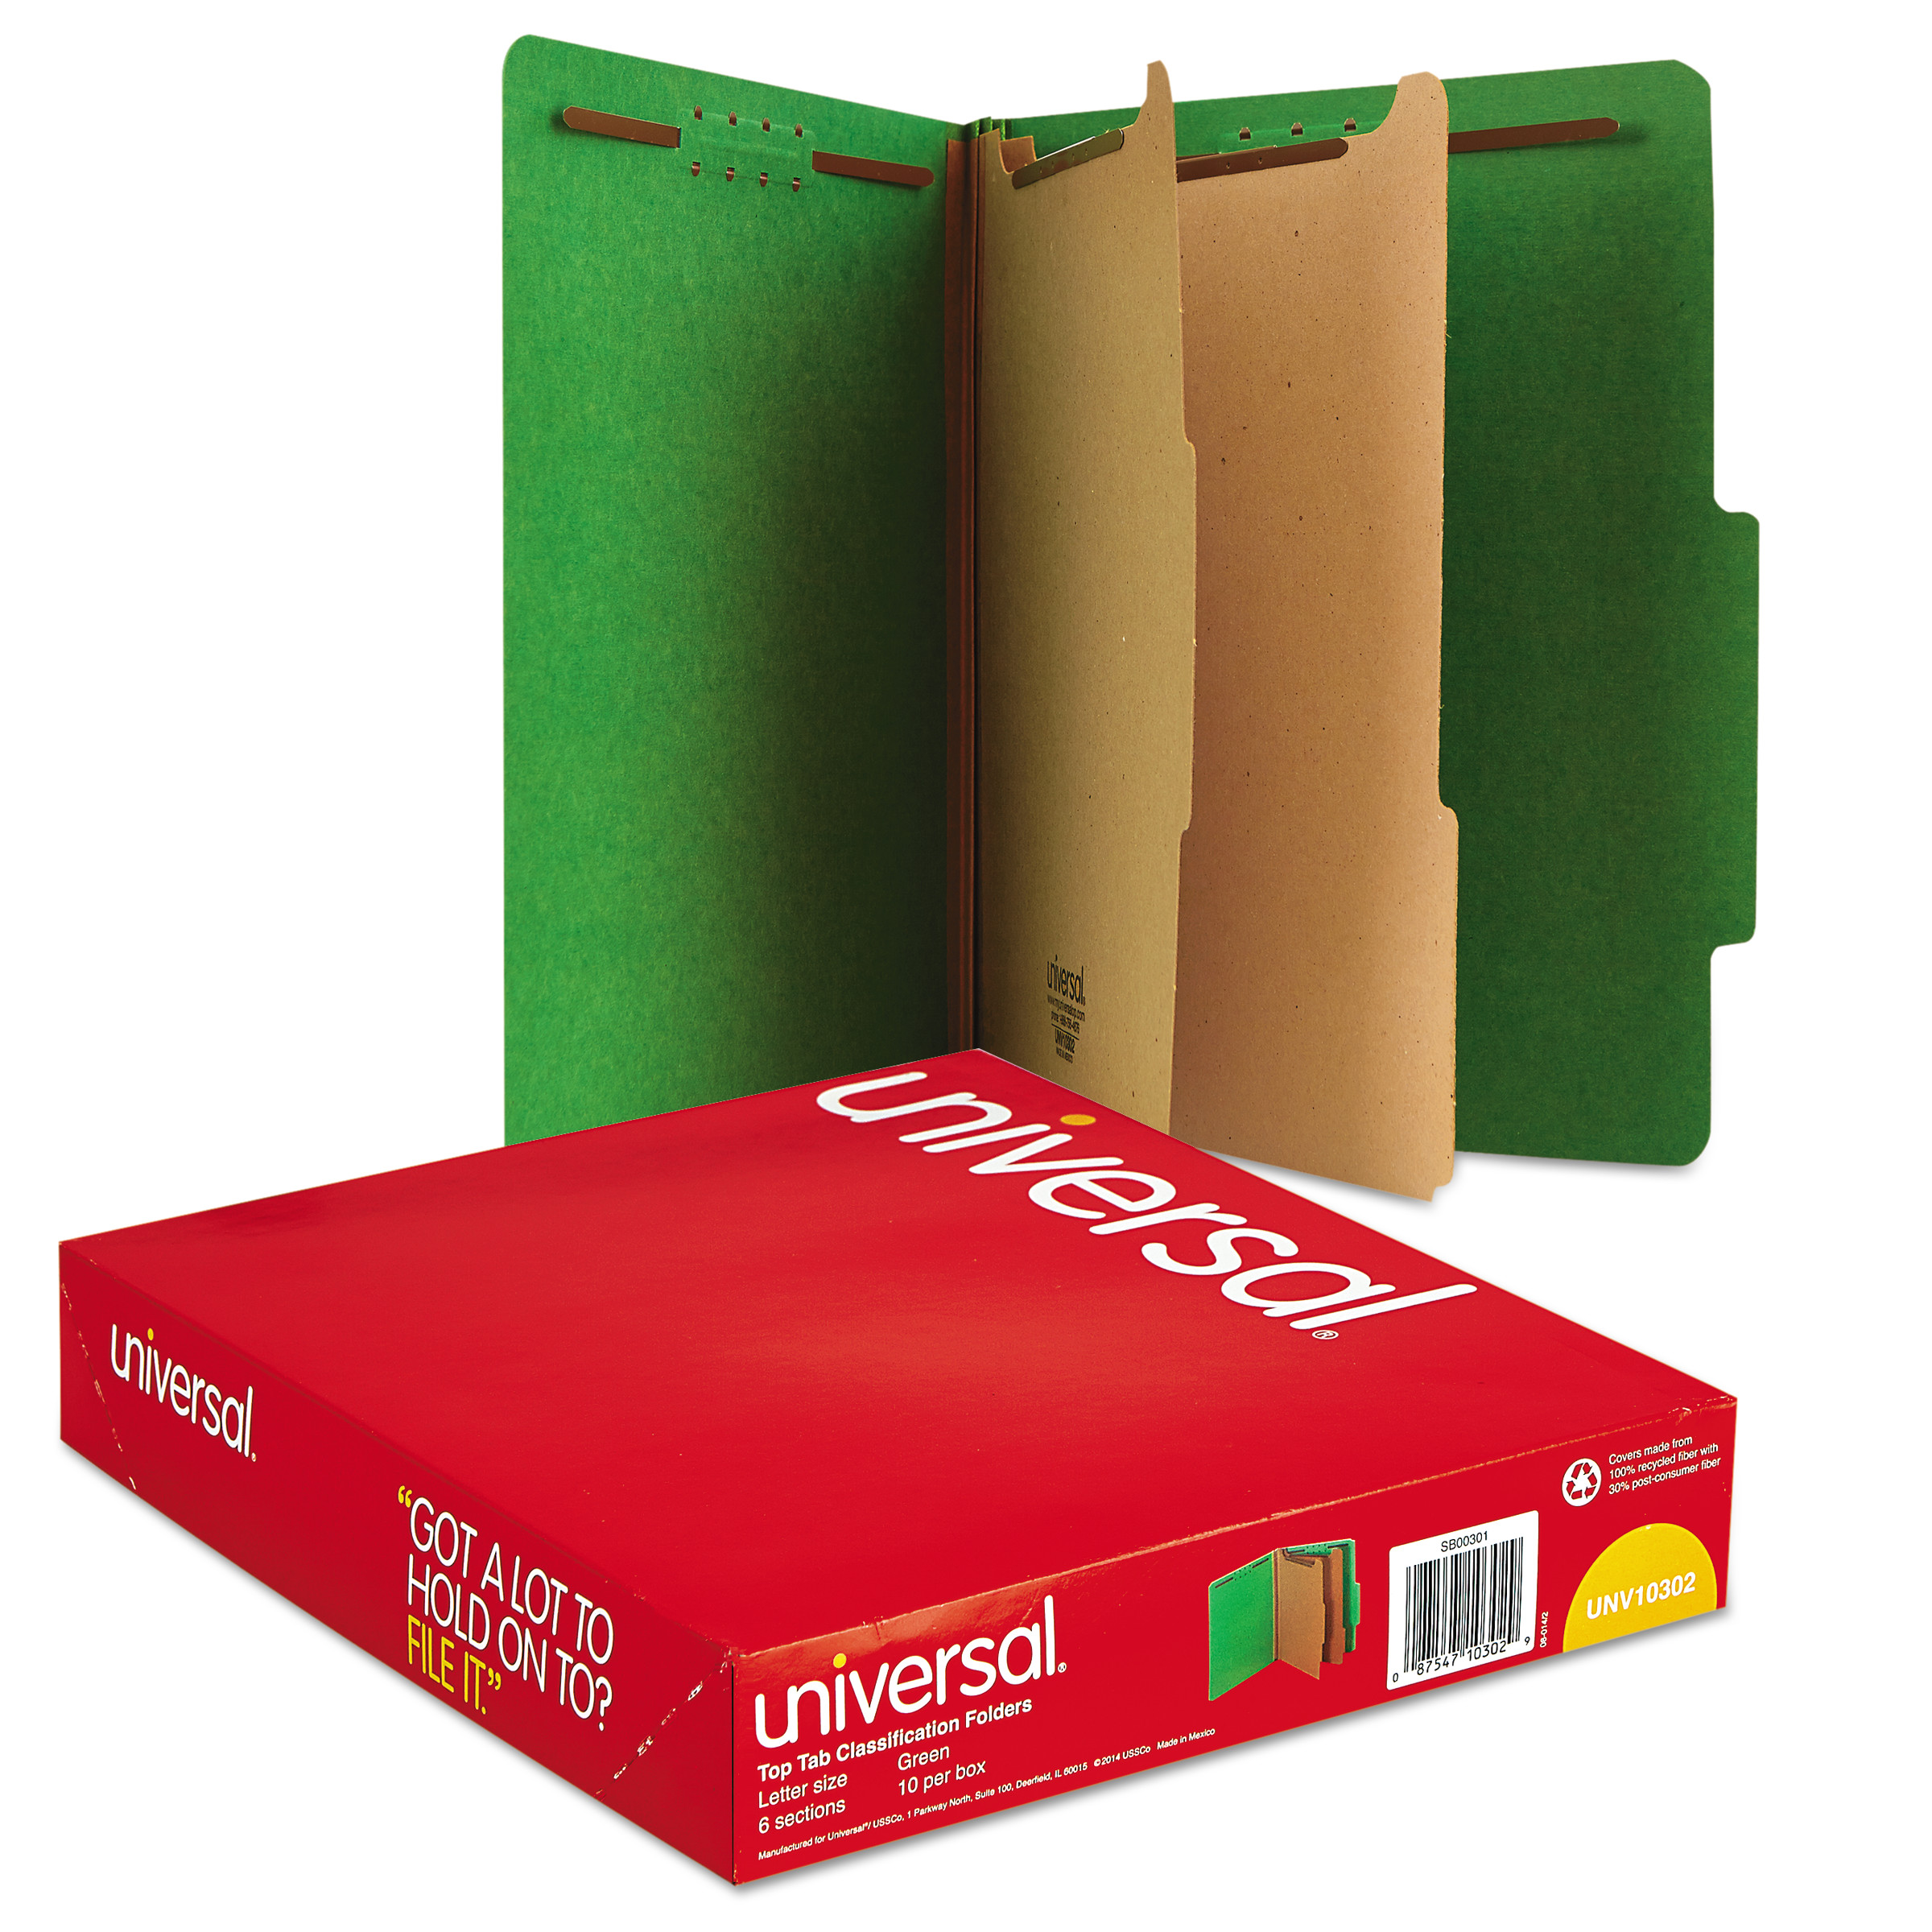 Universal Pressboard Classification Folders, Letter, Six-Section, Emerald Green, 10/Box -UNV10302